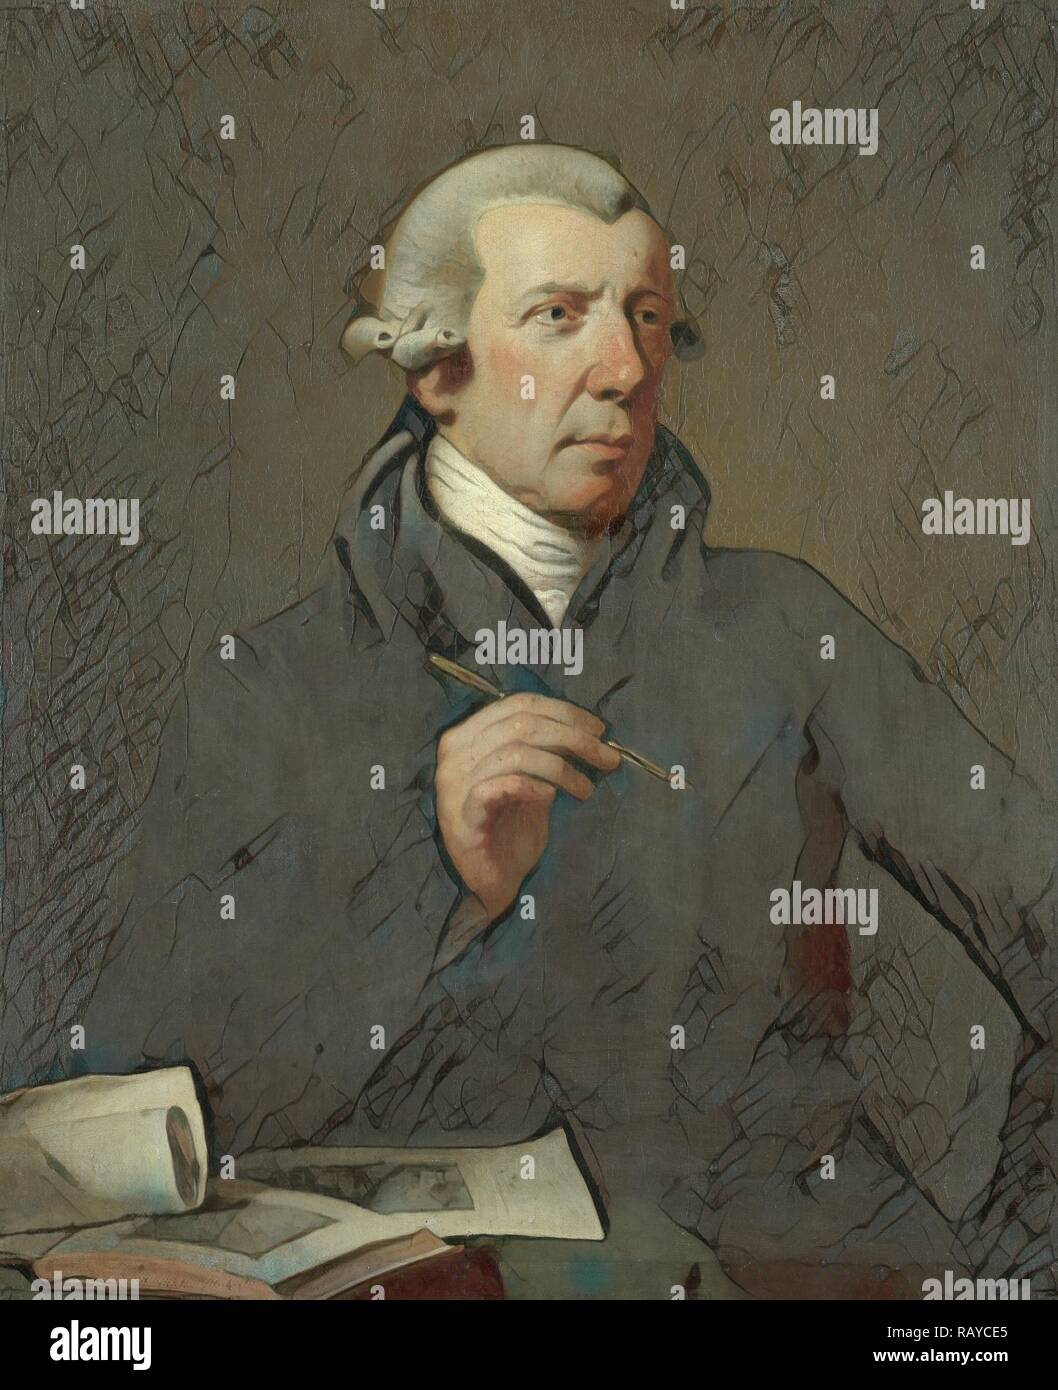 Portrait of Reinier Vinkeles, Draftsman and Engraver, Charles Howard Hodges, 1800 - 1816. Reimagined - Stock Image